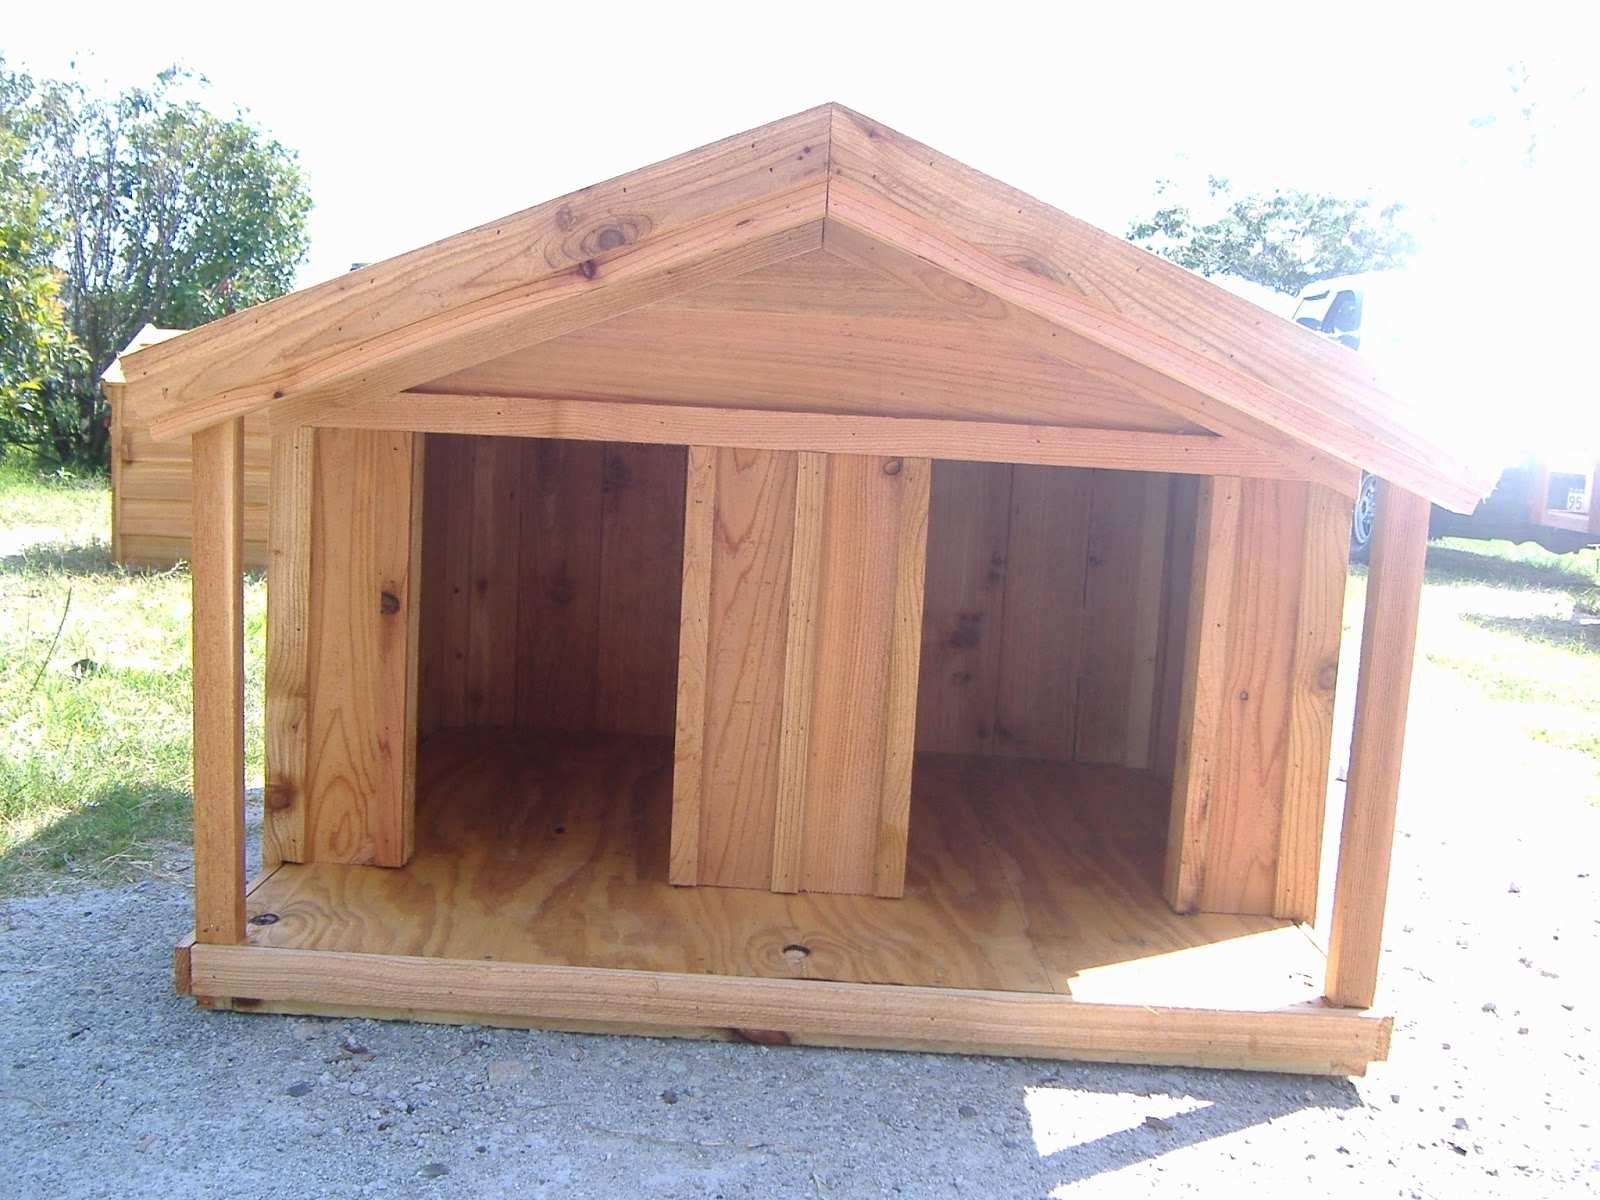 Dog House Plans Pdf Simple Dog House Plans 18 Beautiful Diy Dog House Plans House Plan Casas Para Perros Grandes Casas Para Perros Casas Para Perro Recicladas